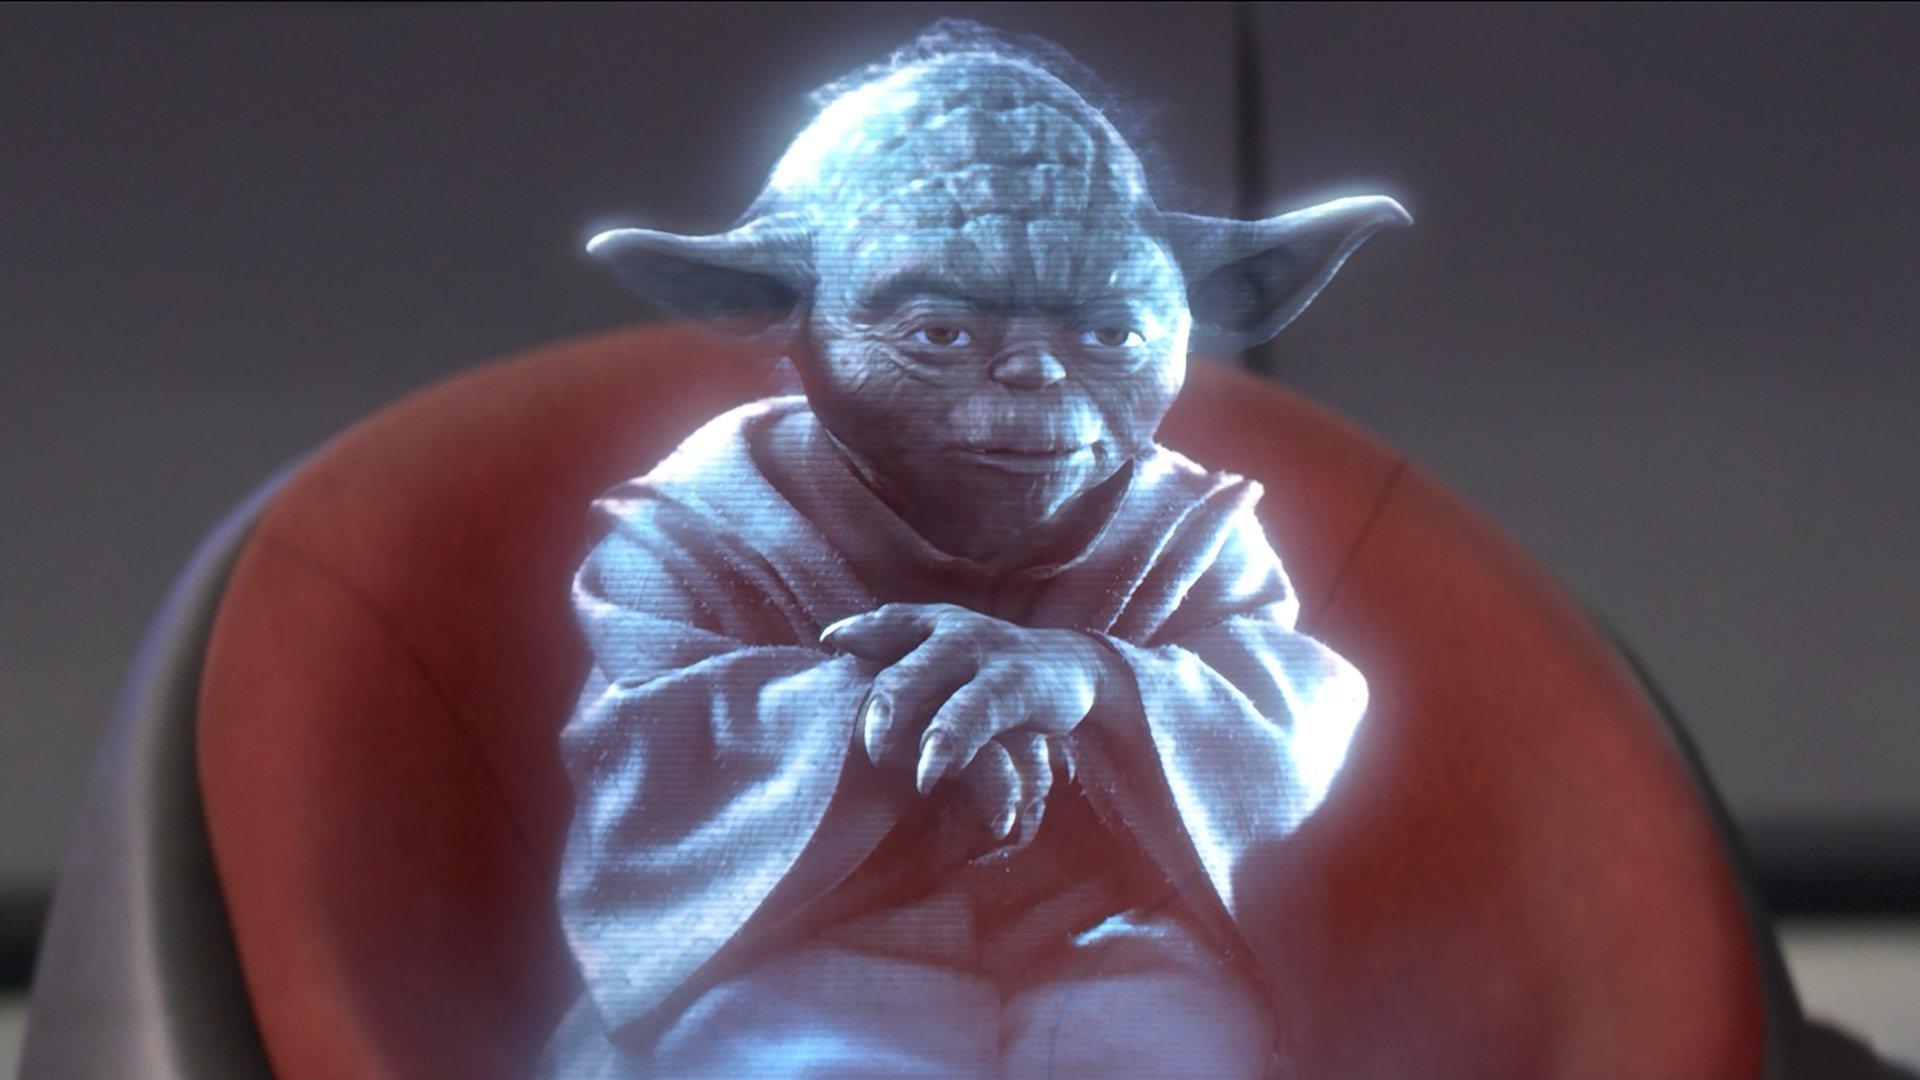 Download Full Hd Star Wars Episode 3 Iii Revenge Of The Sith Desktop Wallpaper Id